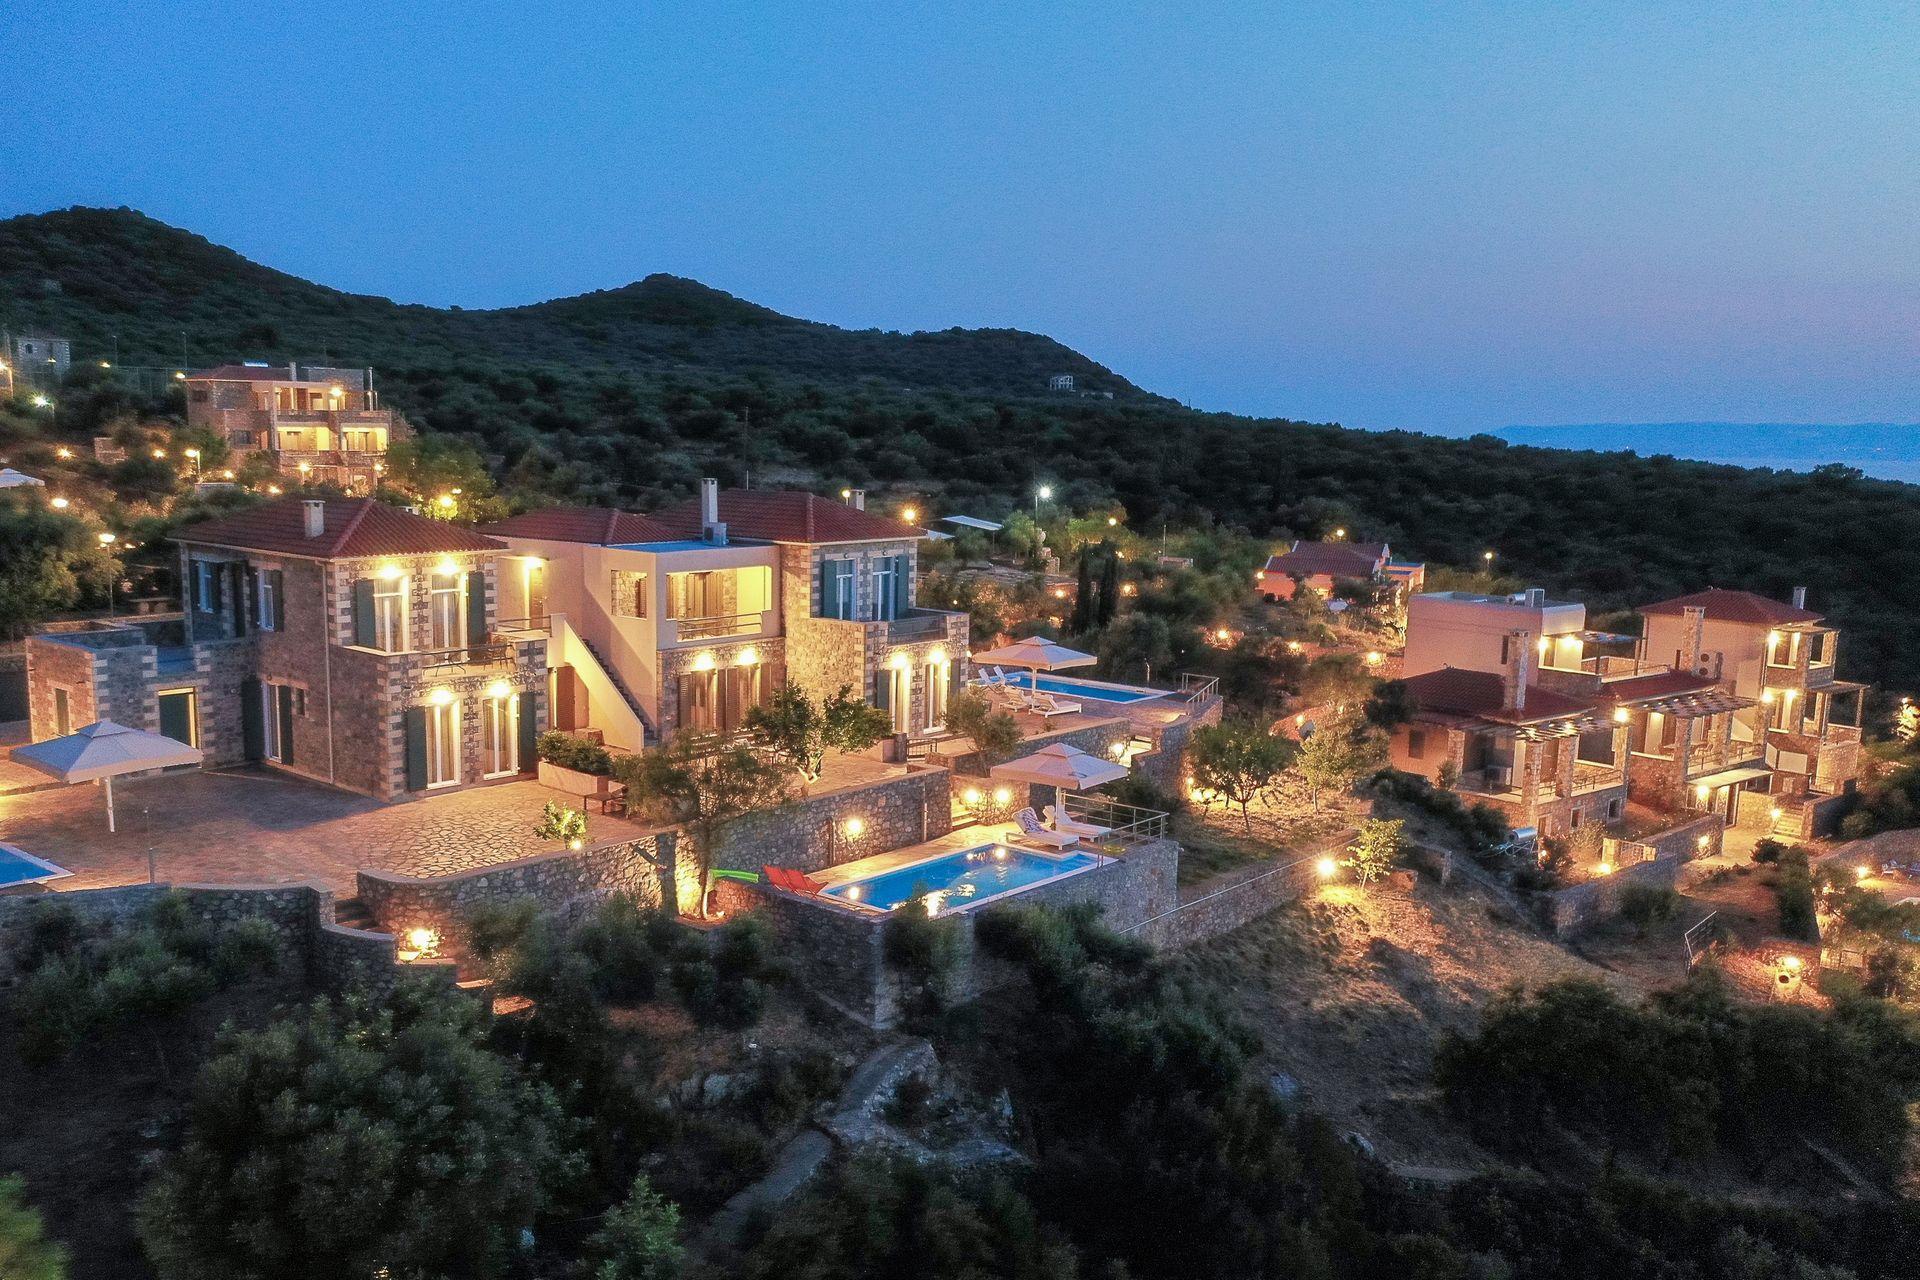 Searocks Exclusive Villas Resort Messinia - Μάνη, Πελοπόννησος ✦ -20% ✦ 3 Ημέρες (2 Διανυκτερεύσεις) ✦ 4 άτομα ✦ Πρωινό ✦ 14/05/2021 έως 30/06/2021 ✦ Υπέροχη Τοποθεσία!